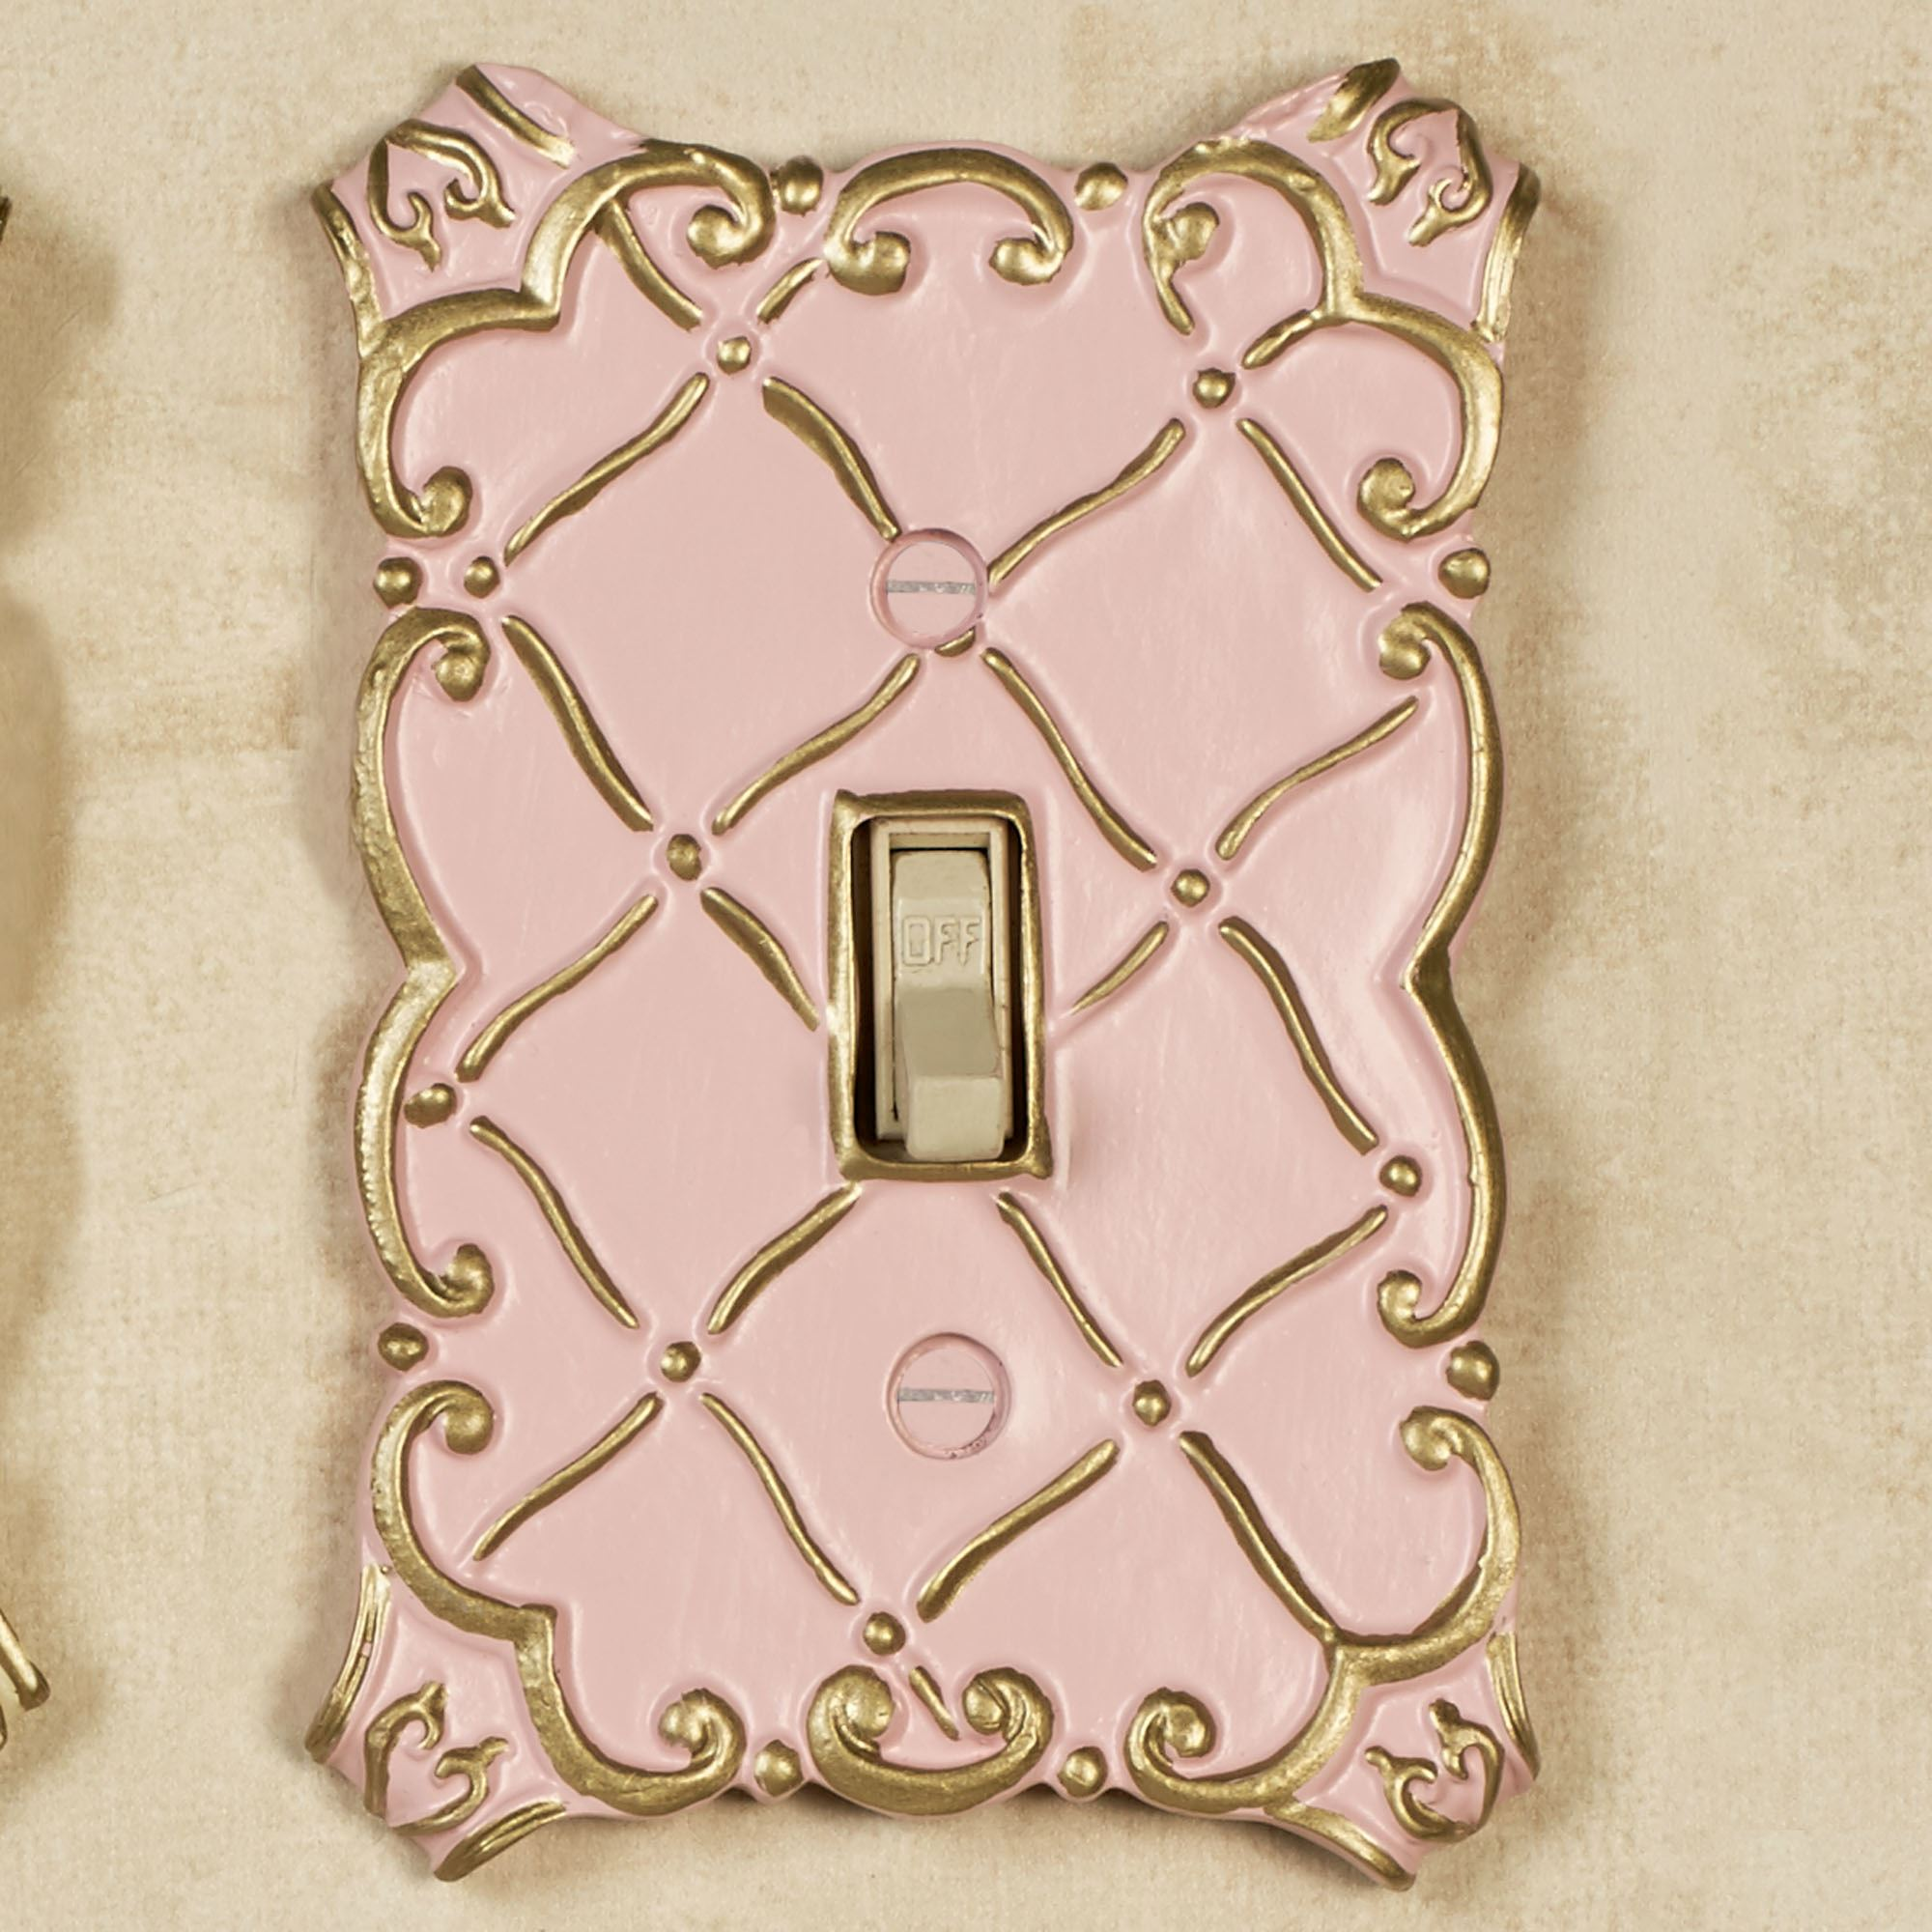 Decorative Switchplates Angelitta Decorative Switchplates